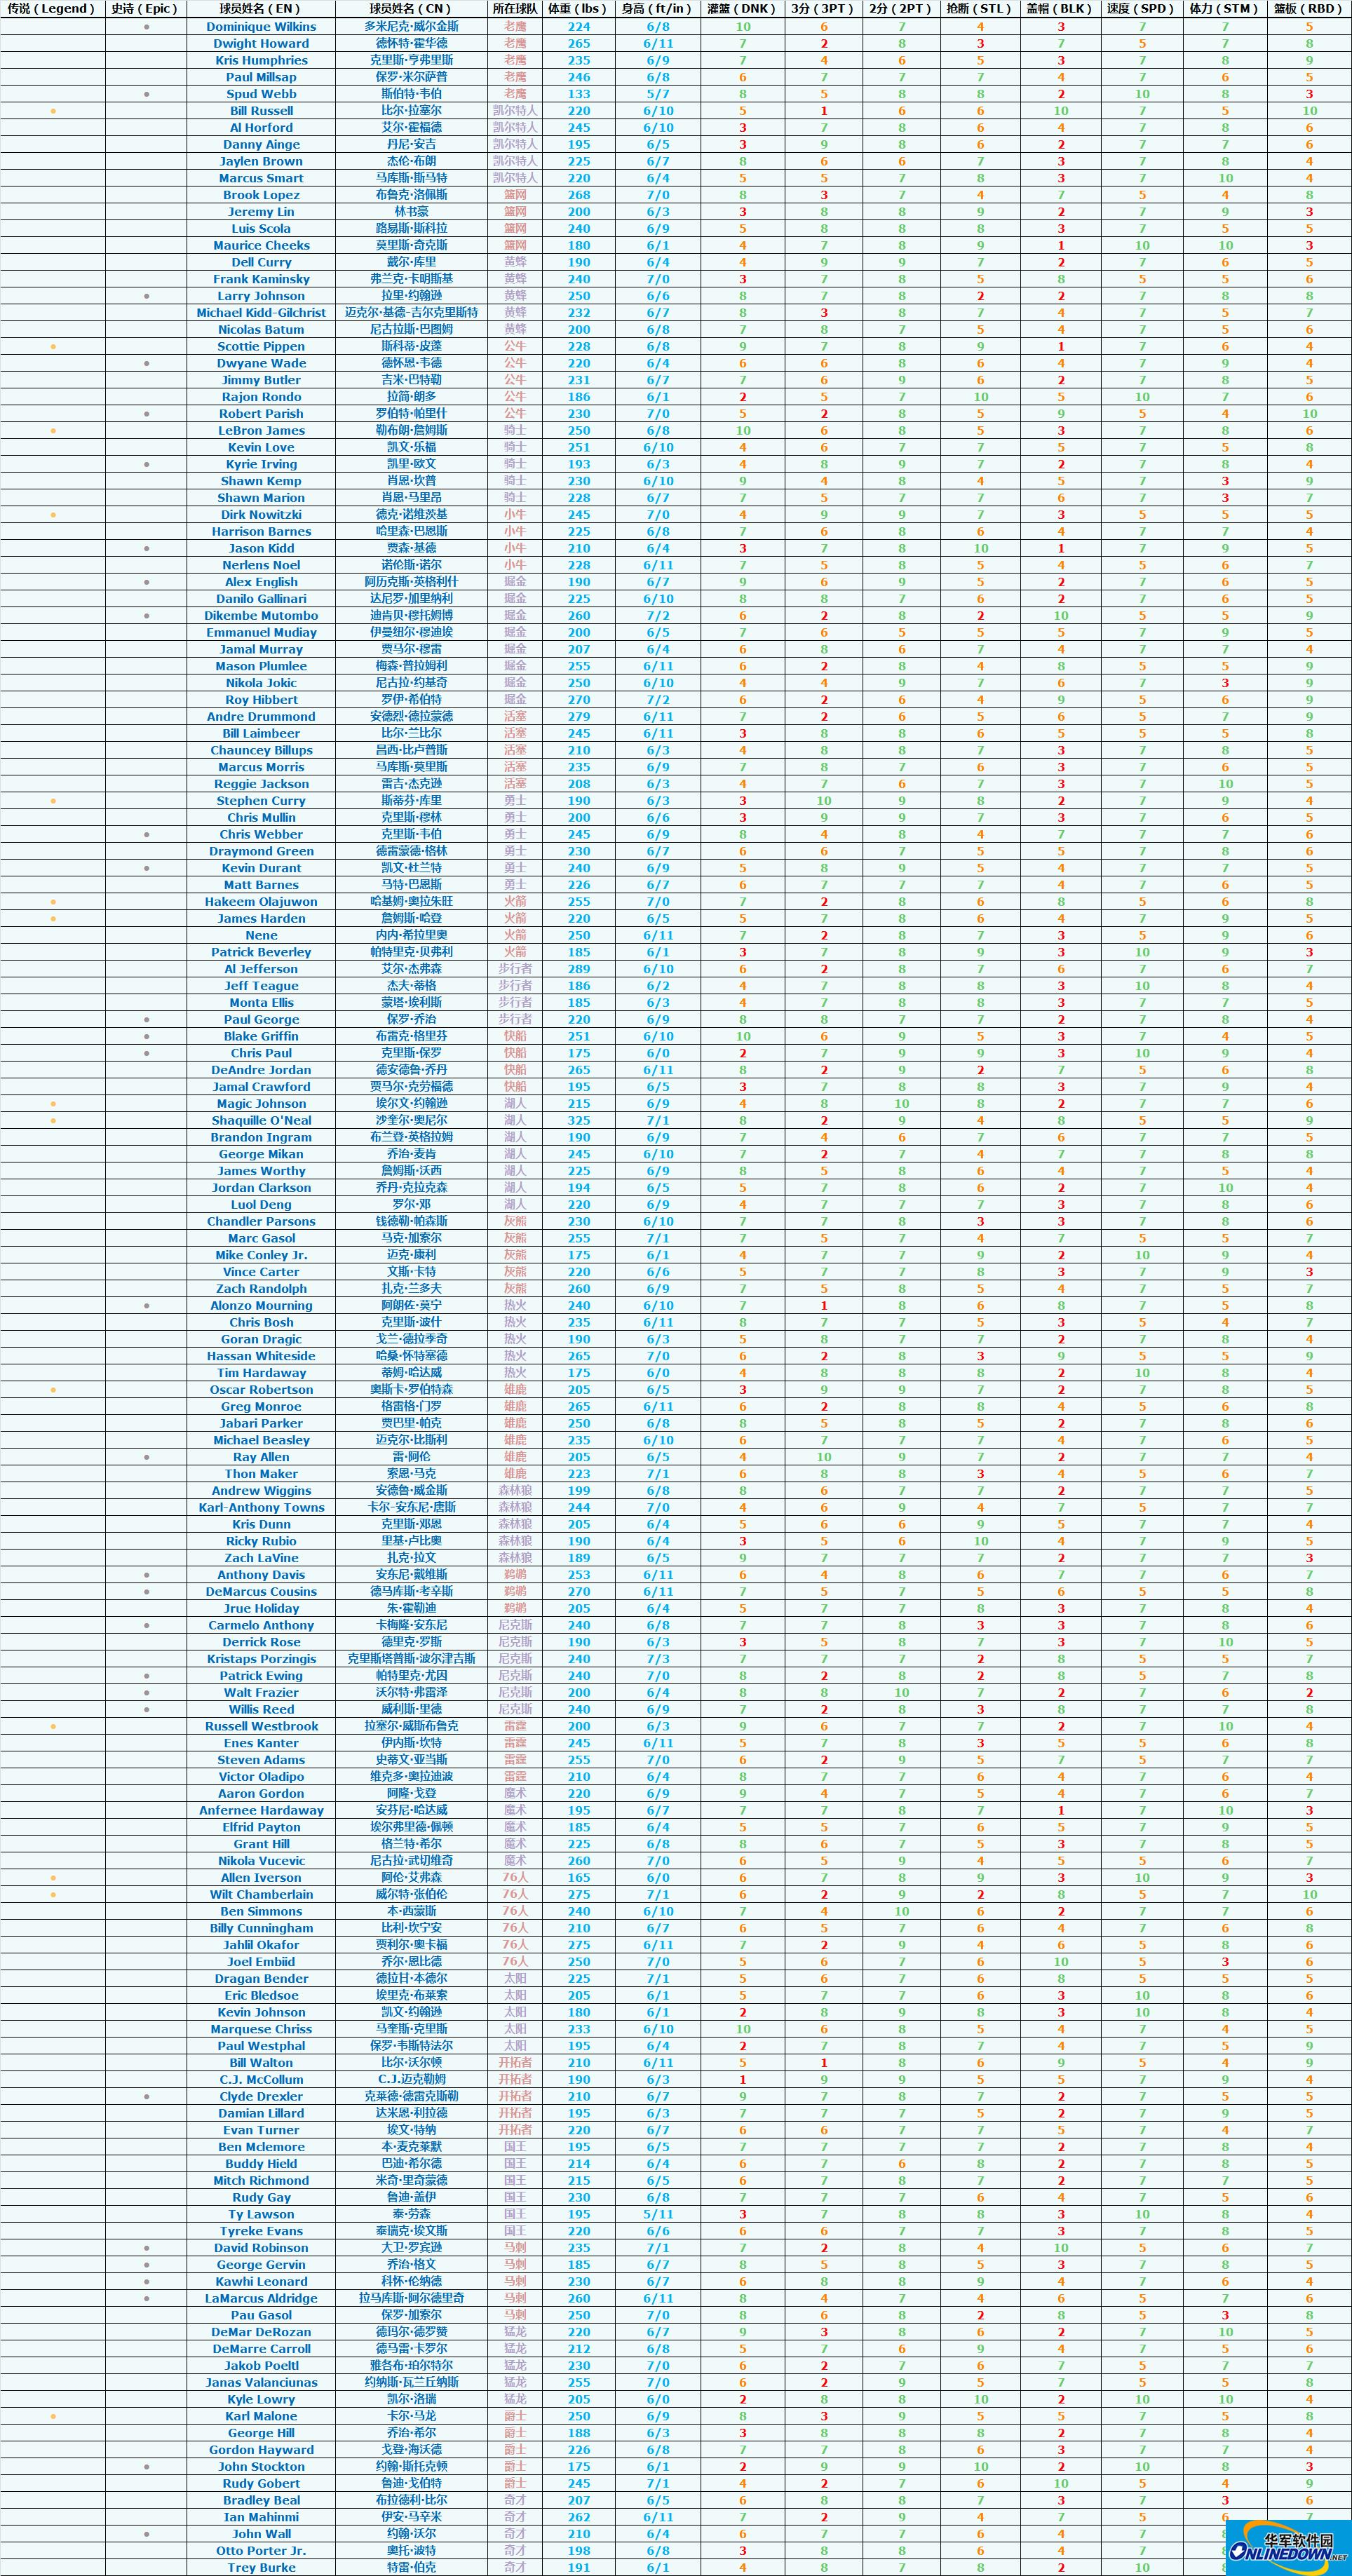 NBA游乐场v1.1.0全球员属性Excek数据表